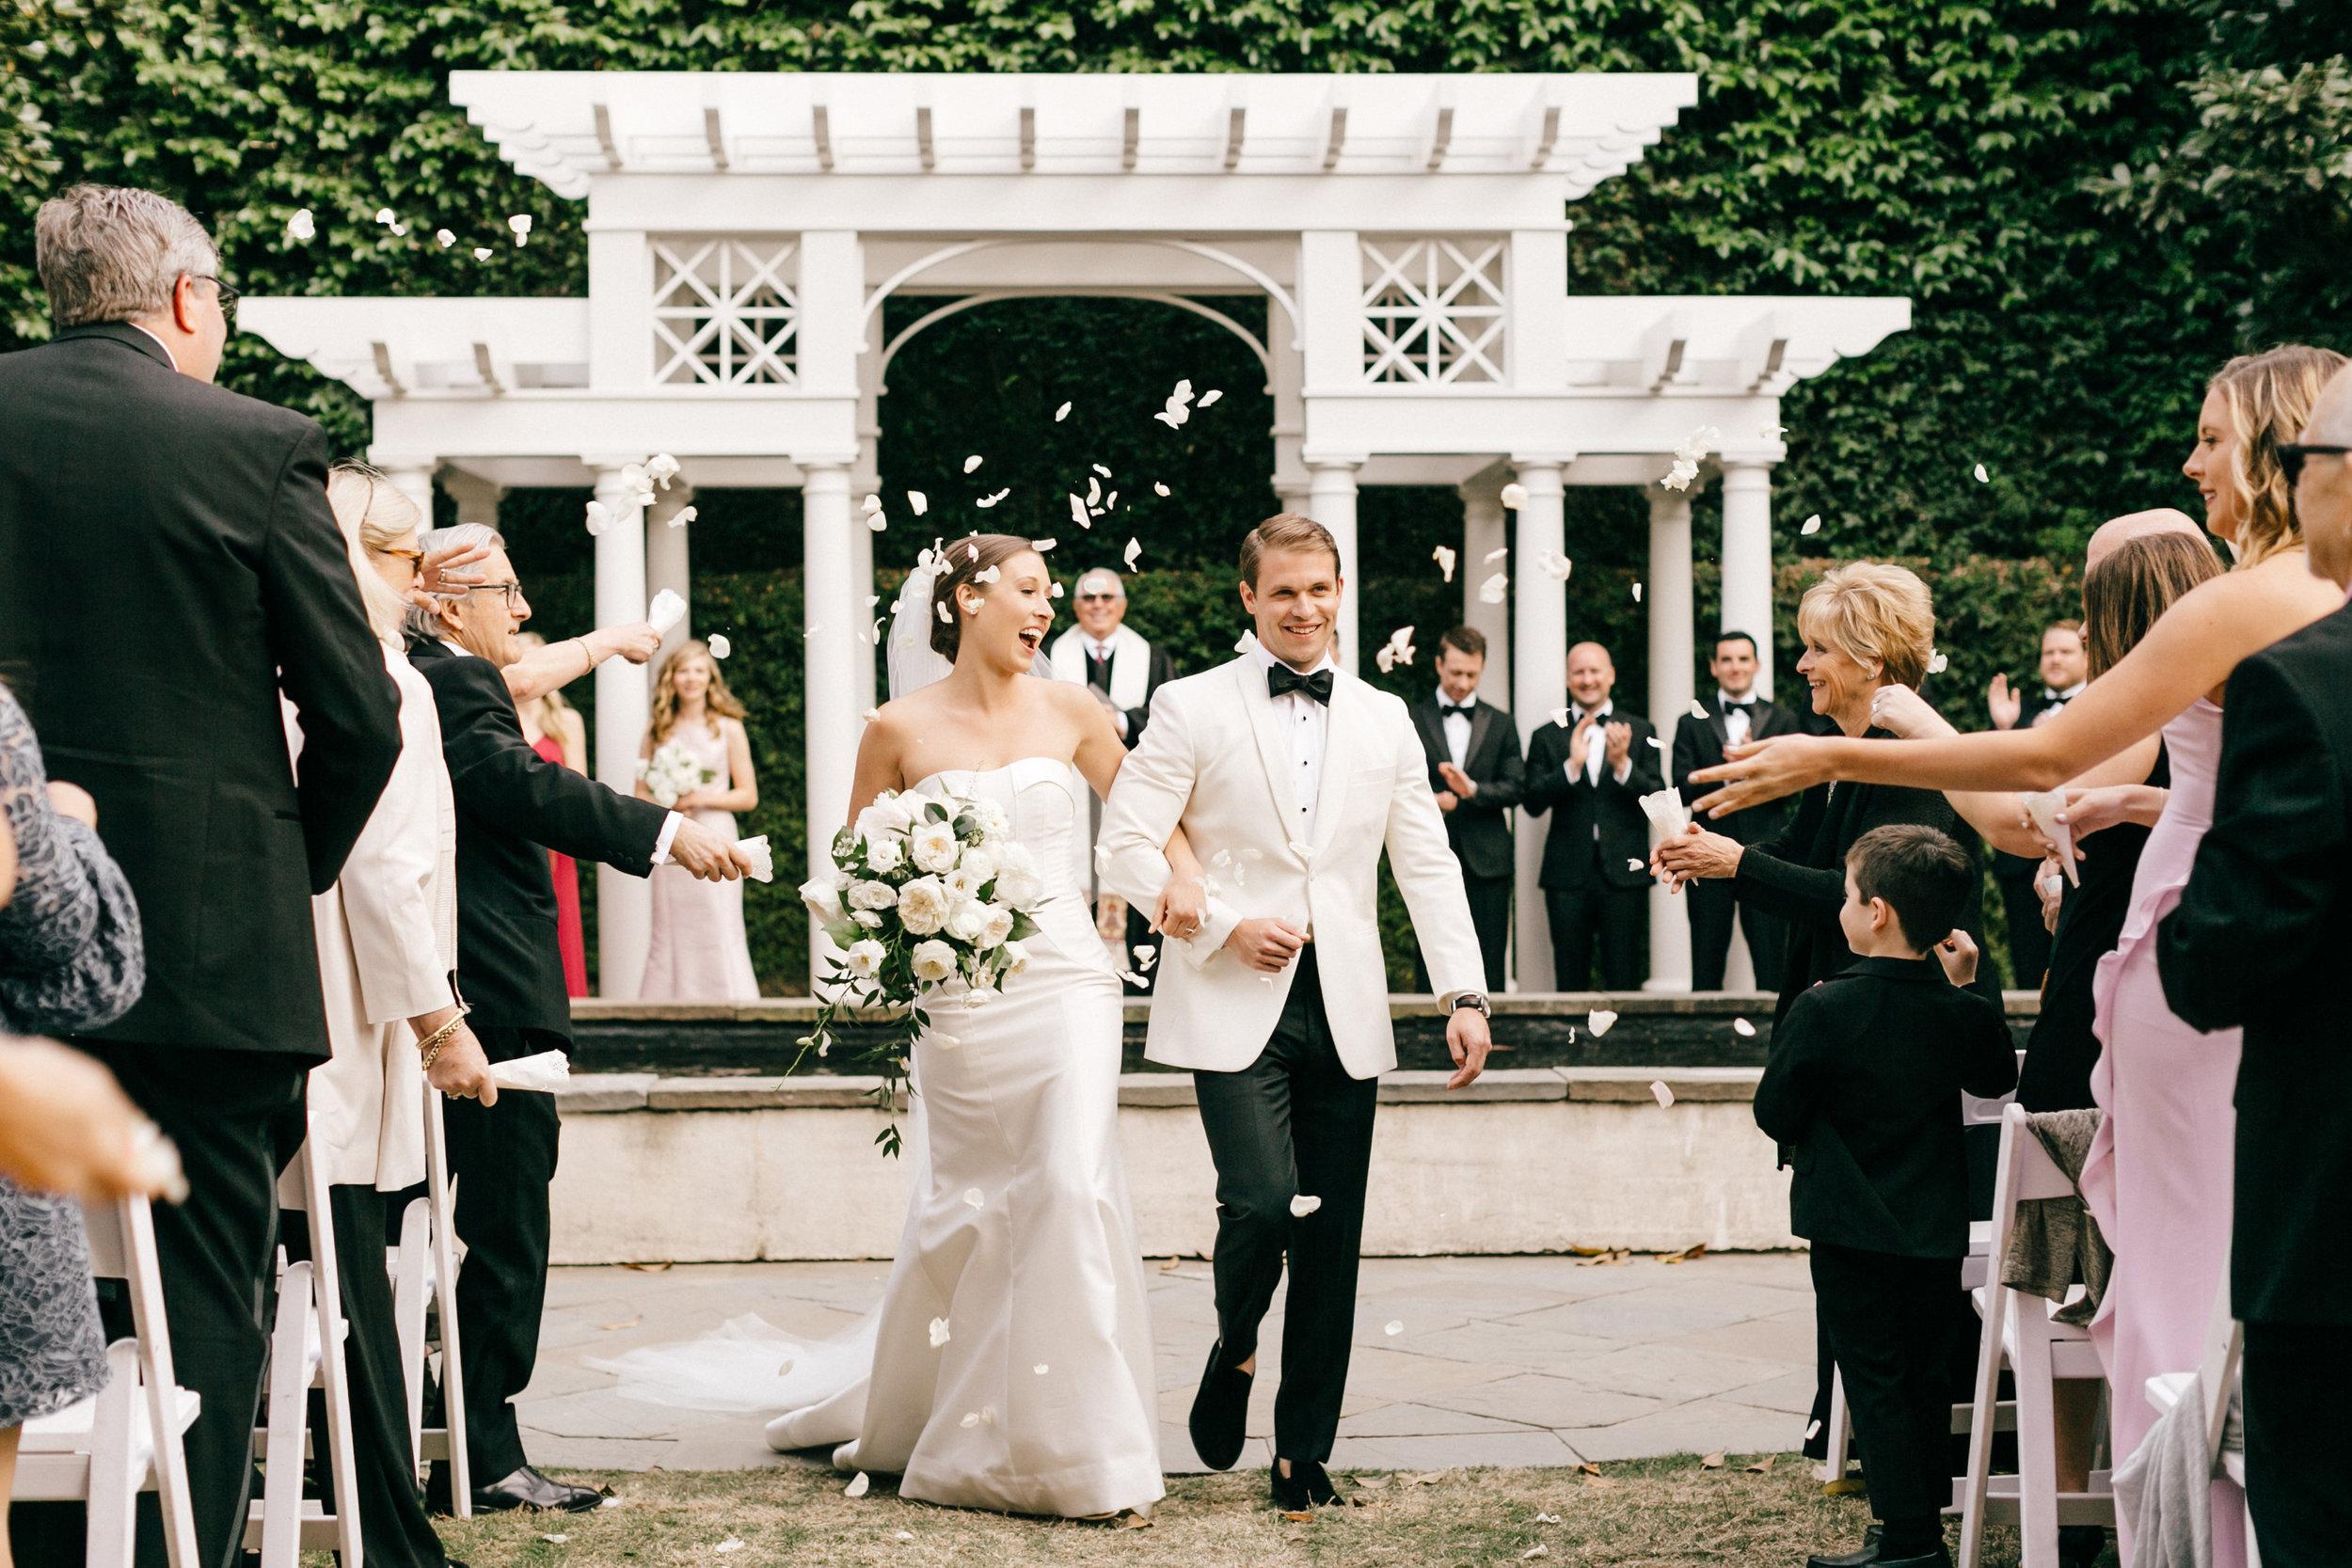 doloughty-wedding-609.jpg